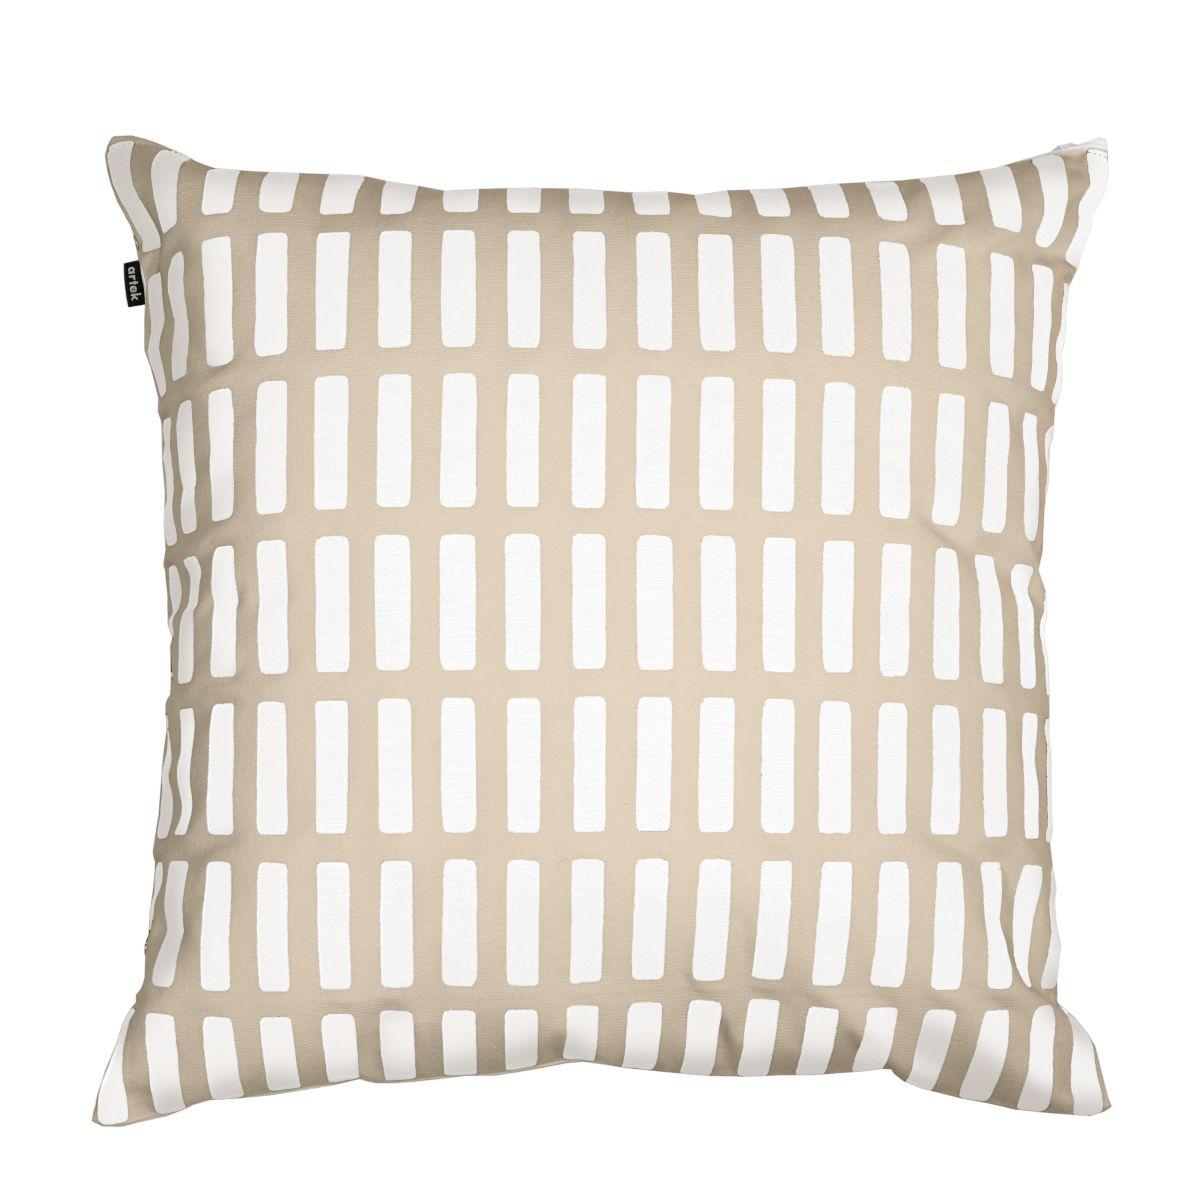 Siena-Cushion-Cover-Cotton-Canvas-large-50-x-50-cm-sand-white-3976656